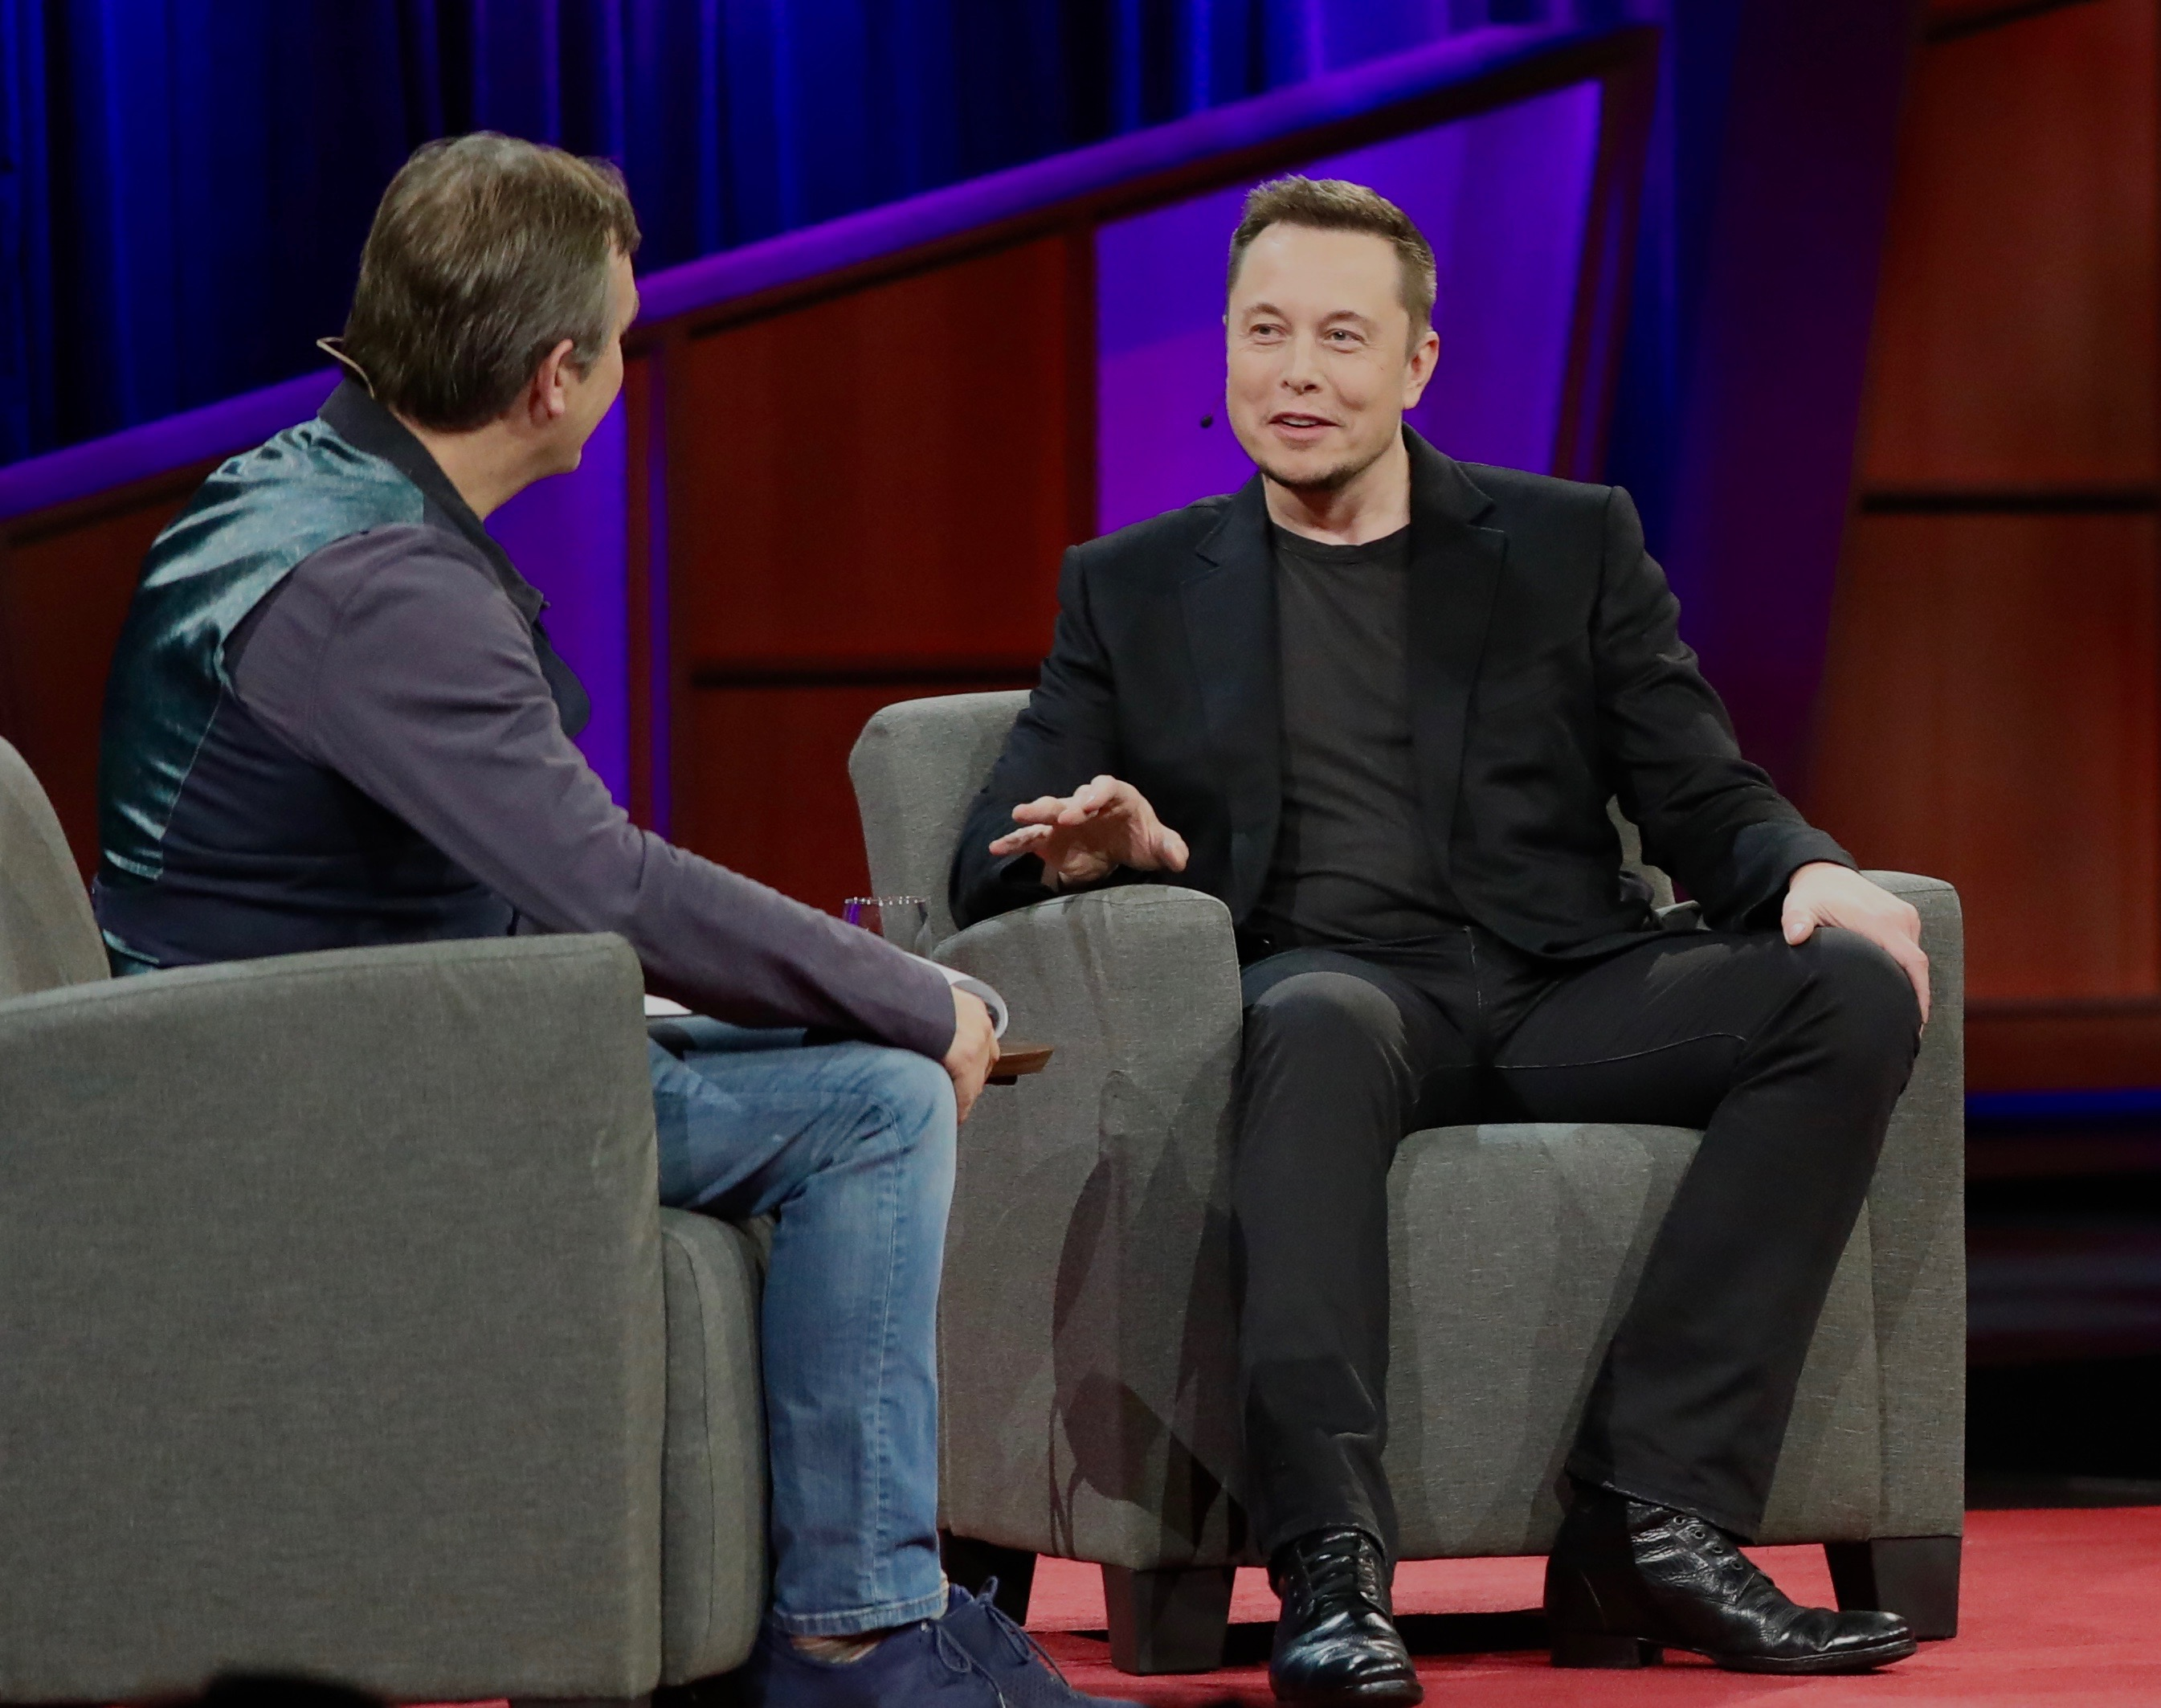 Image result for Elon Musk image